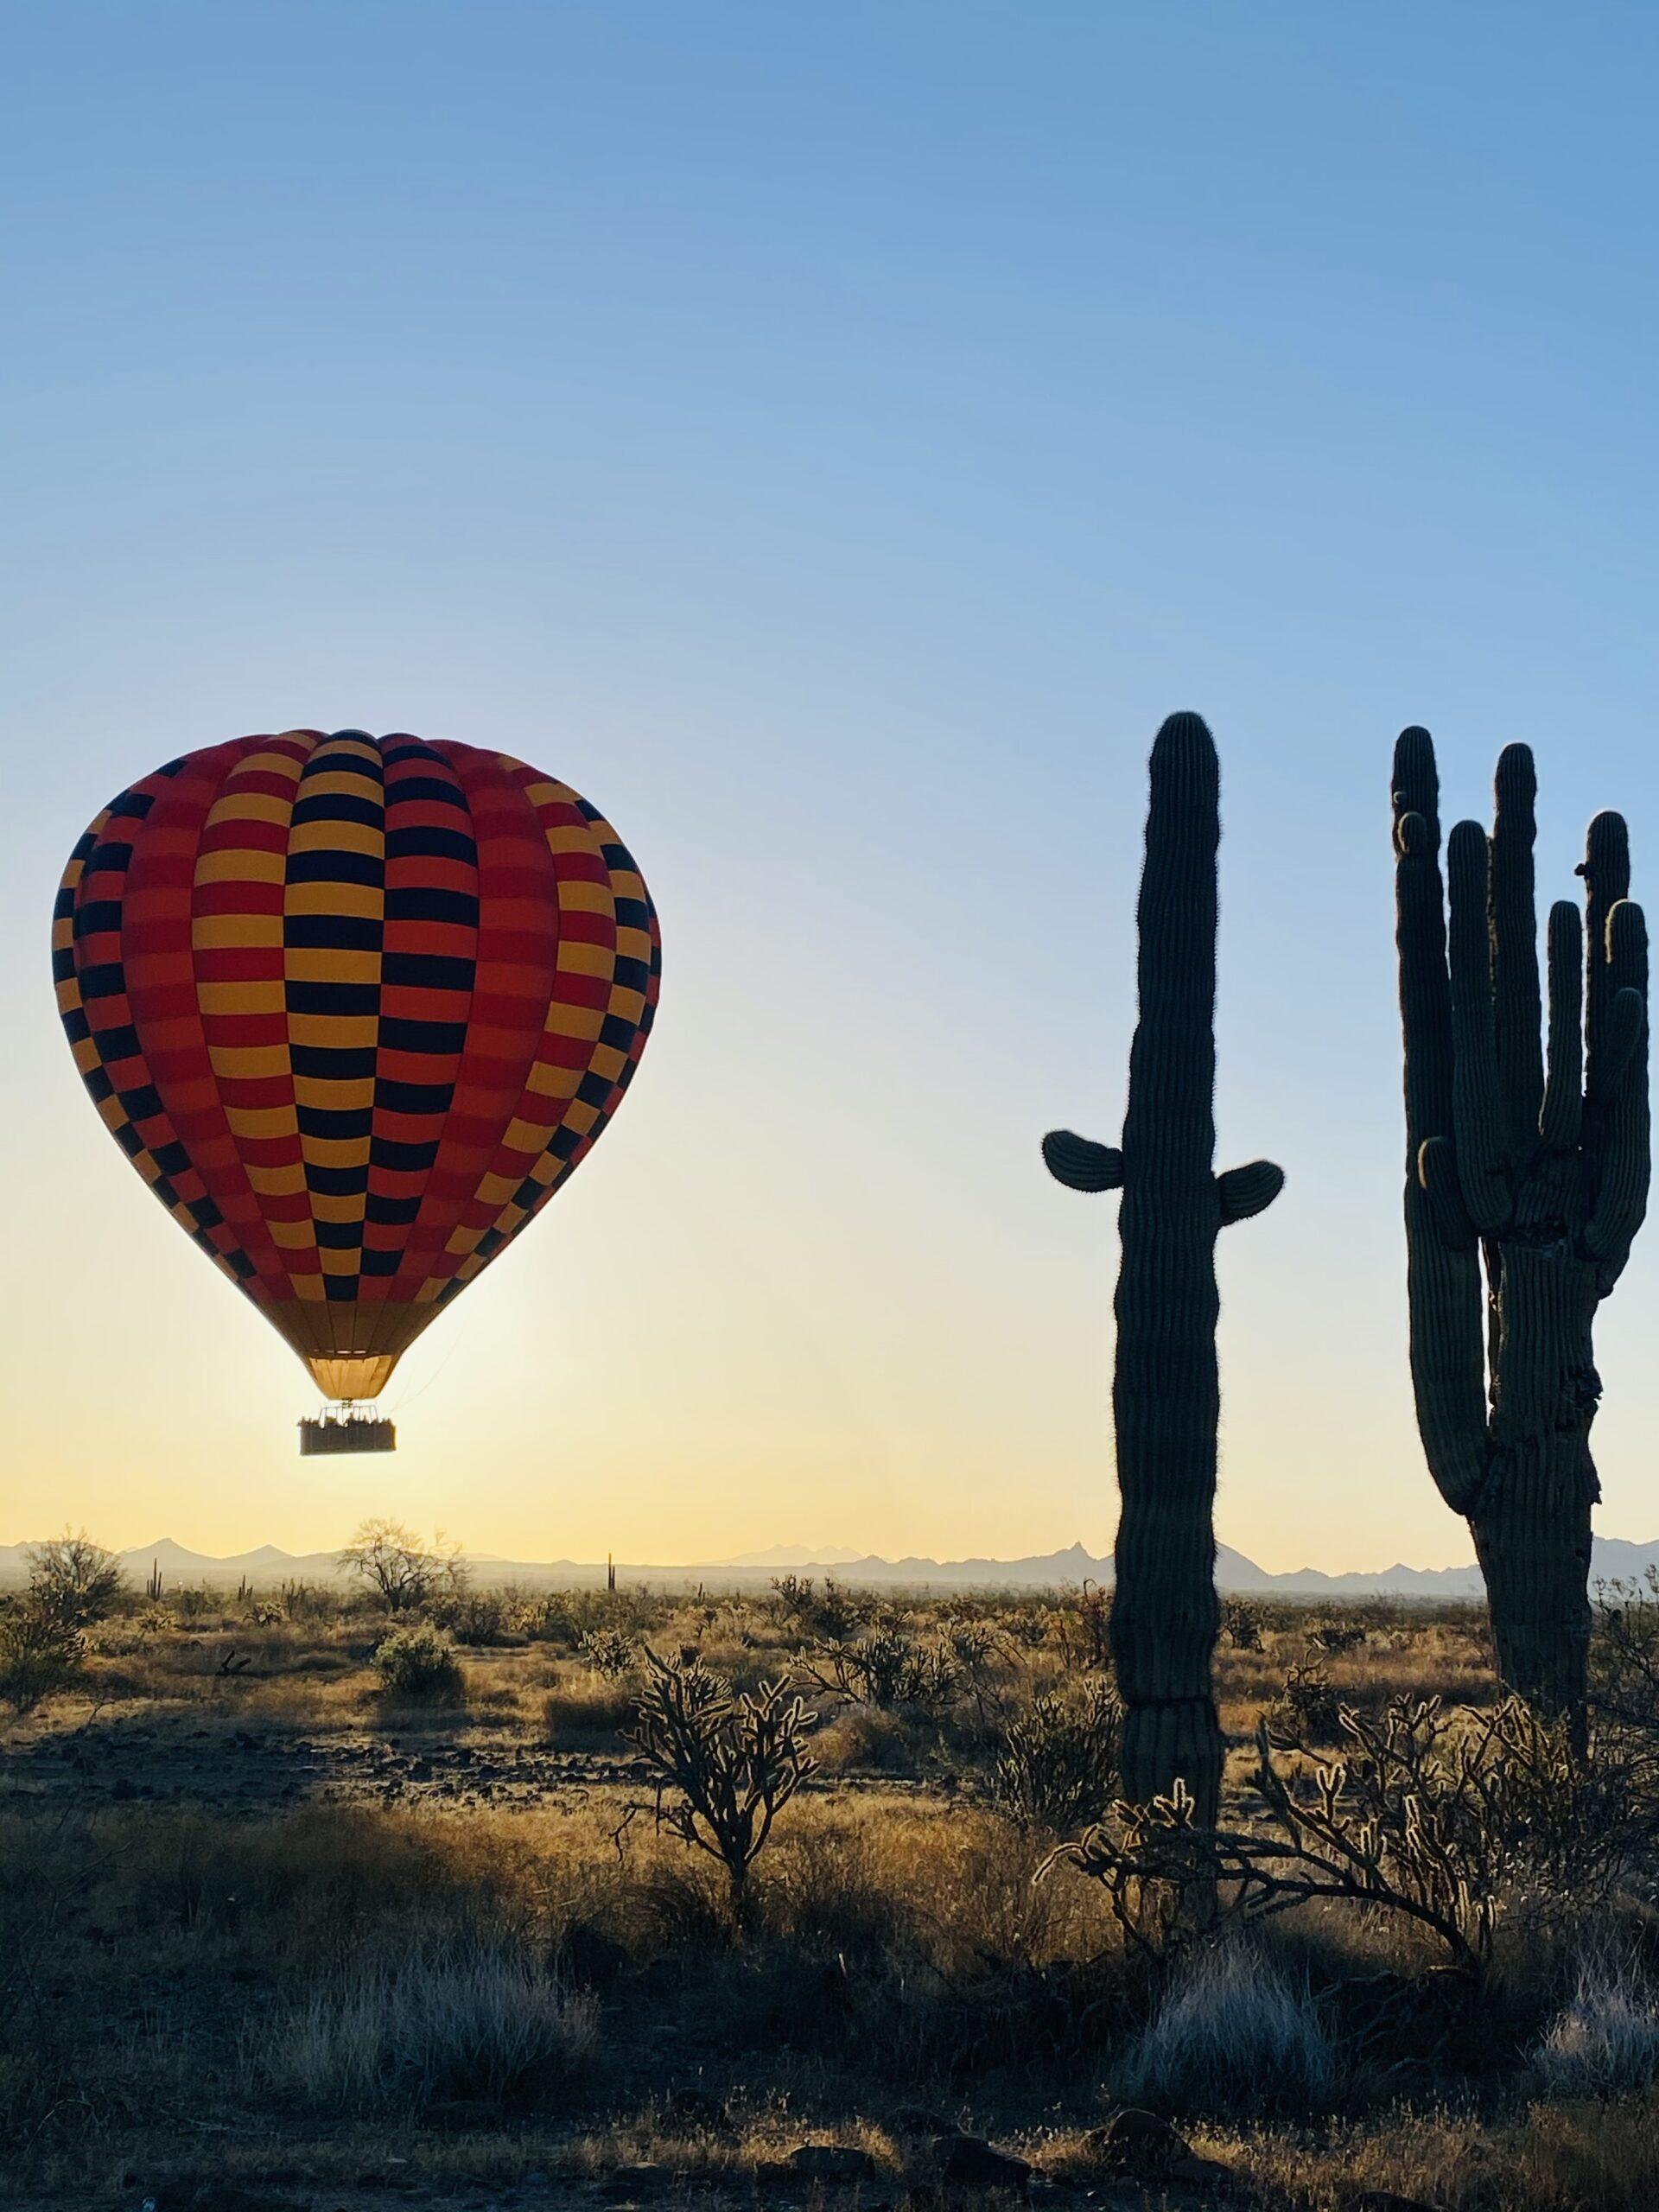 arizona-hot-air-balloon-phoenix-scottsdale-cactus